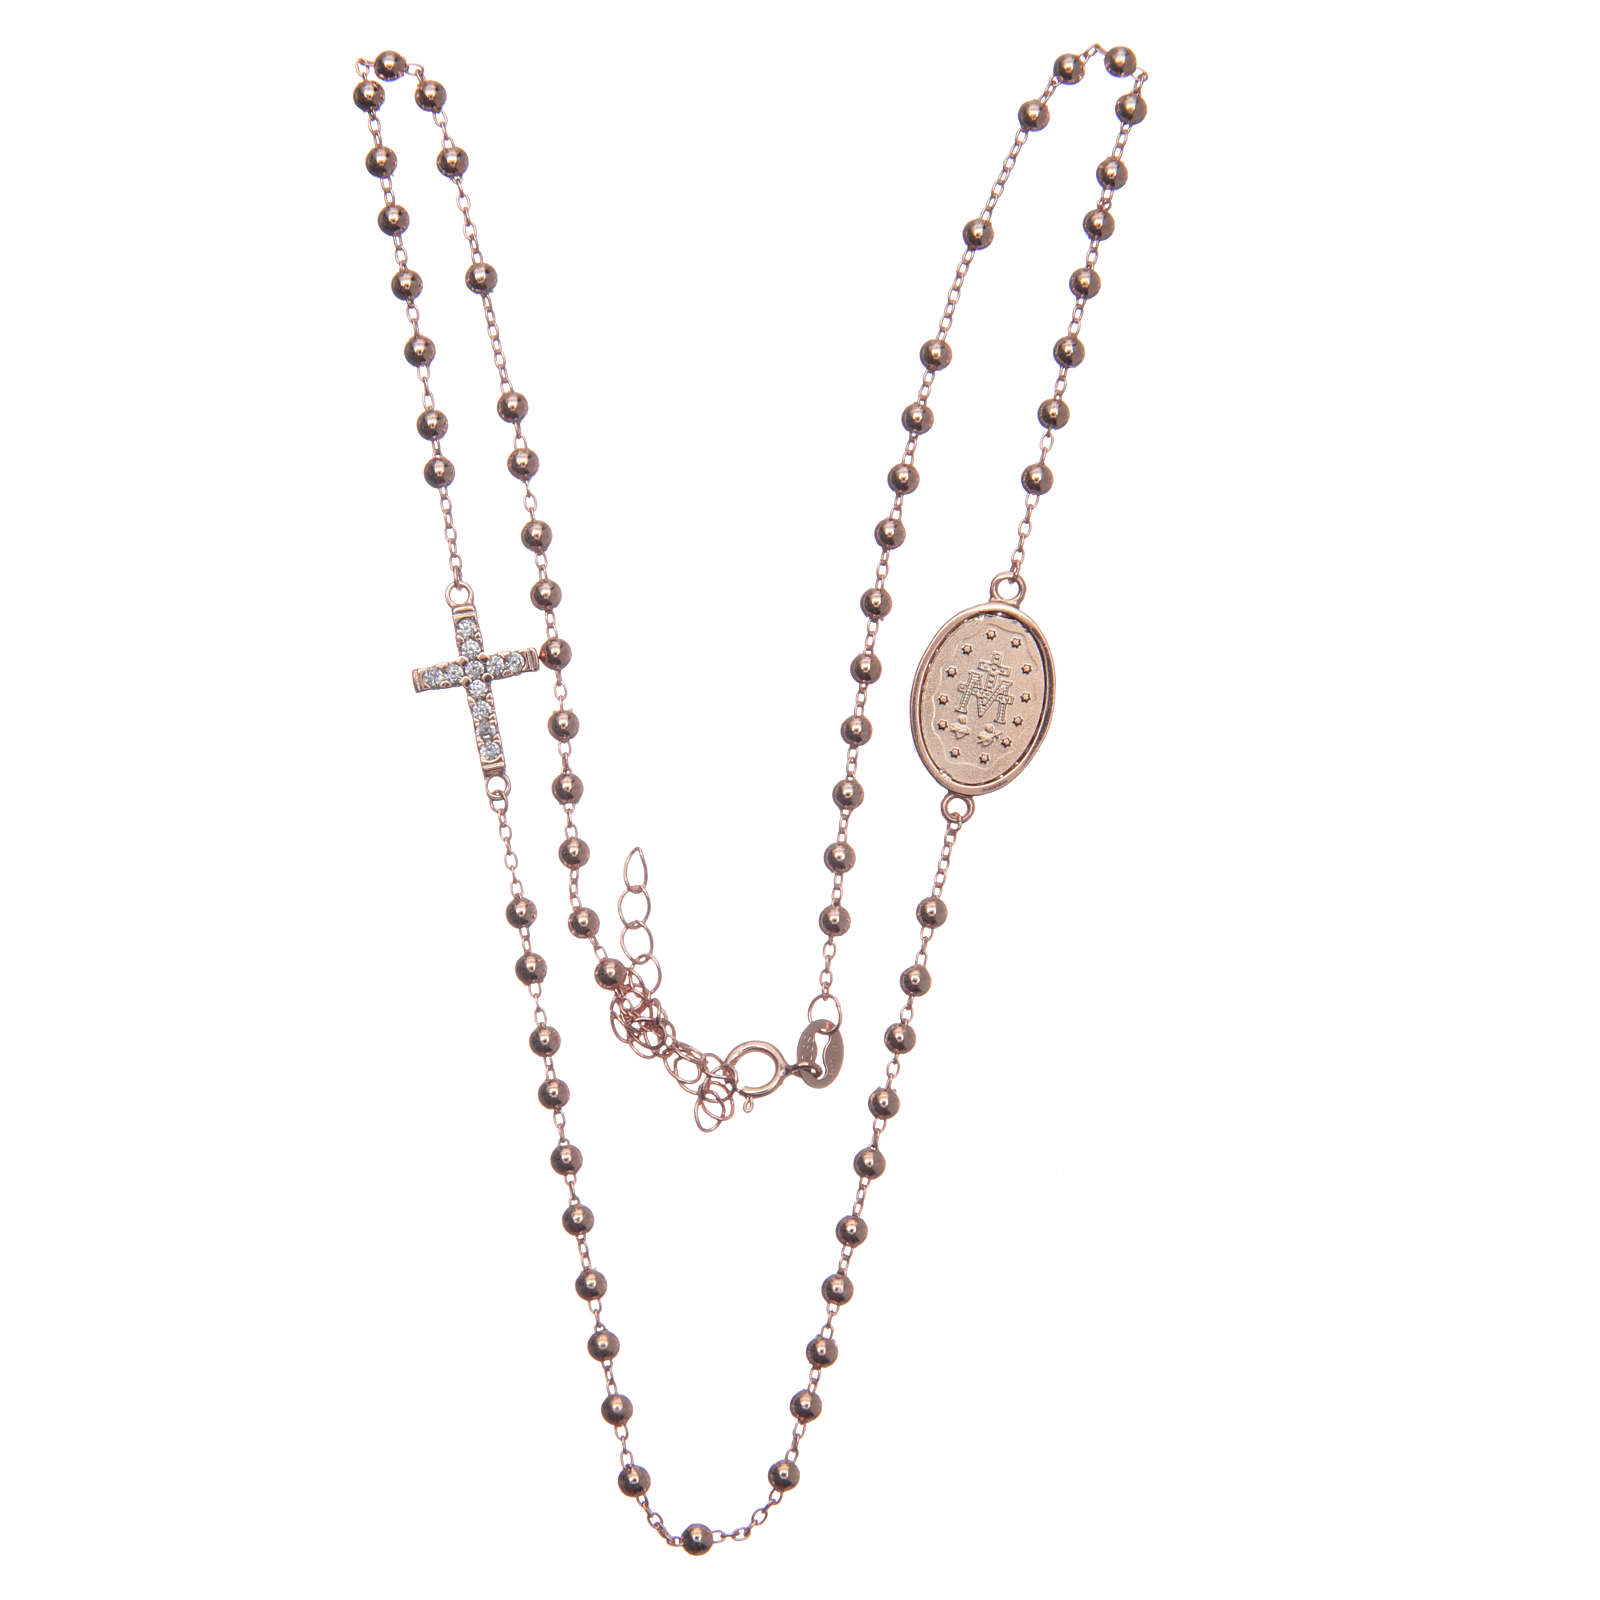 Rosario girocollo rosé zirconi bianchi argento 925 4